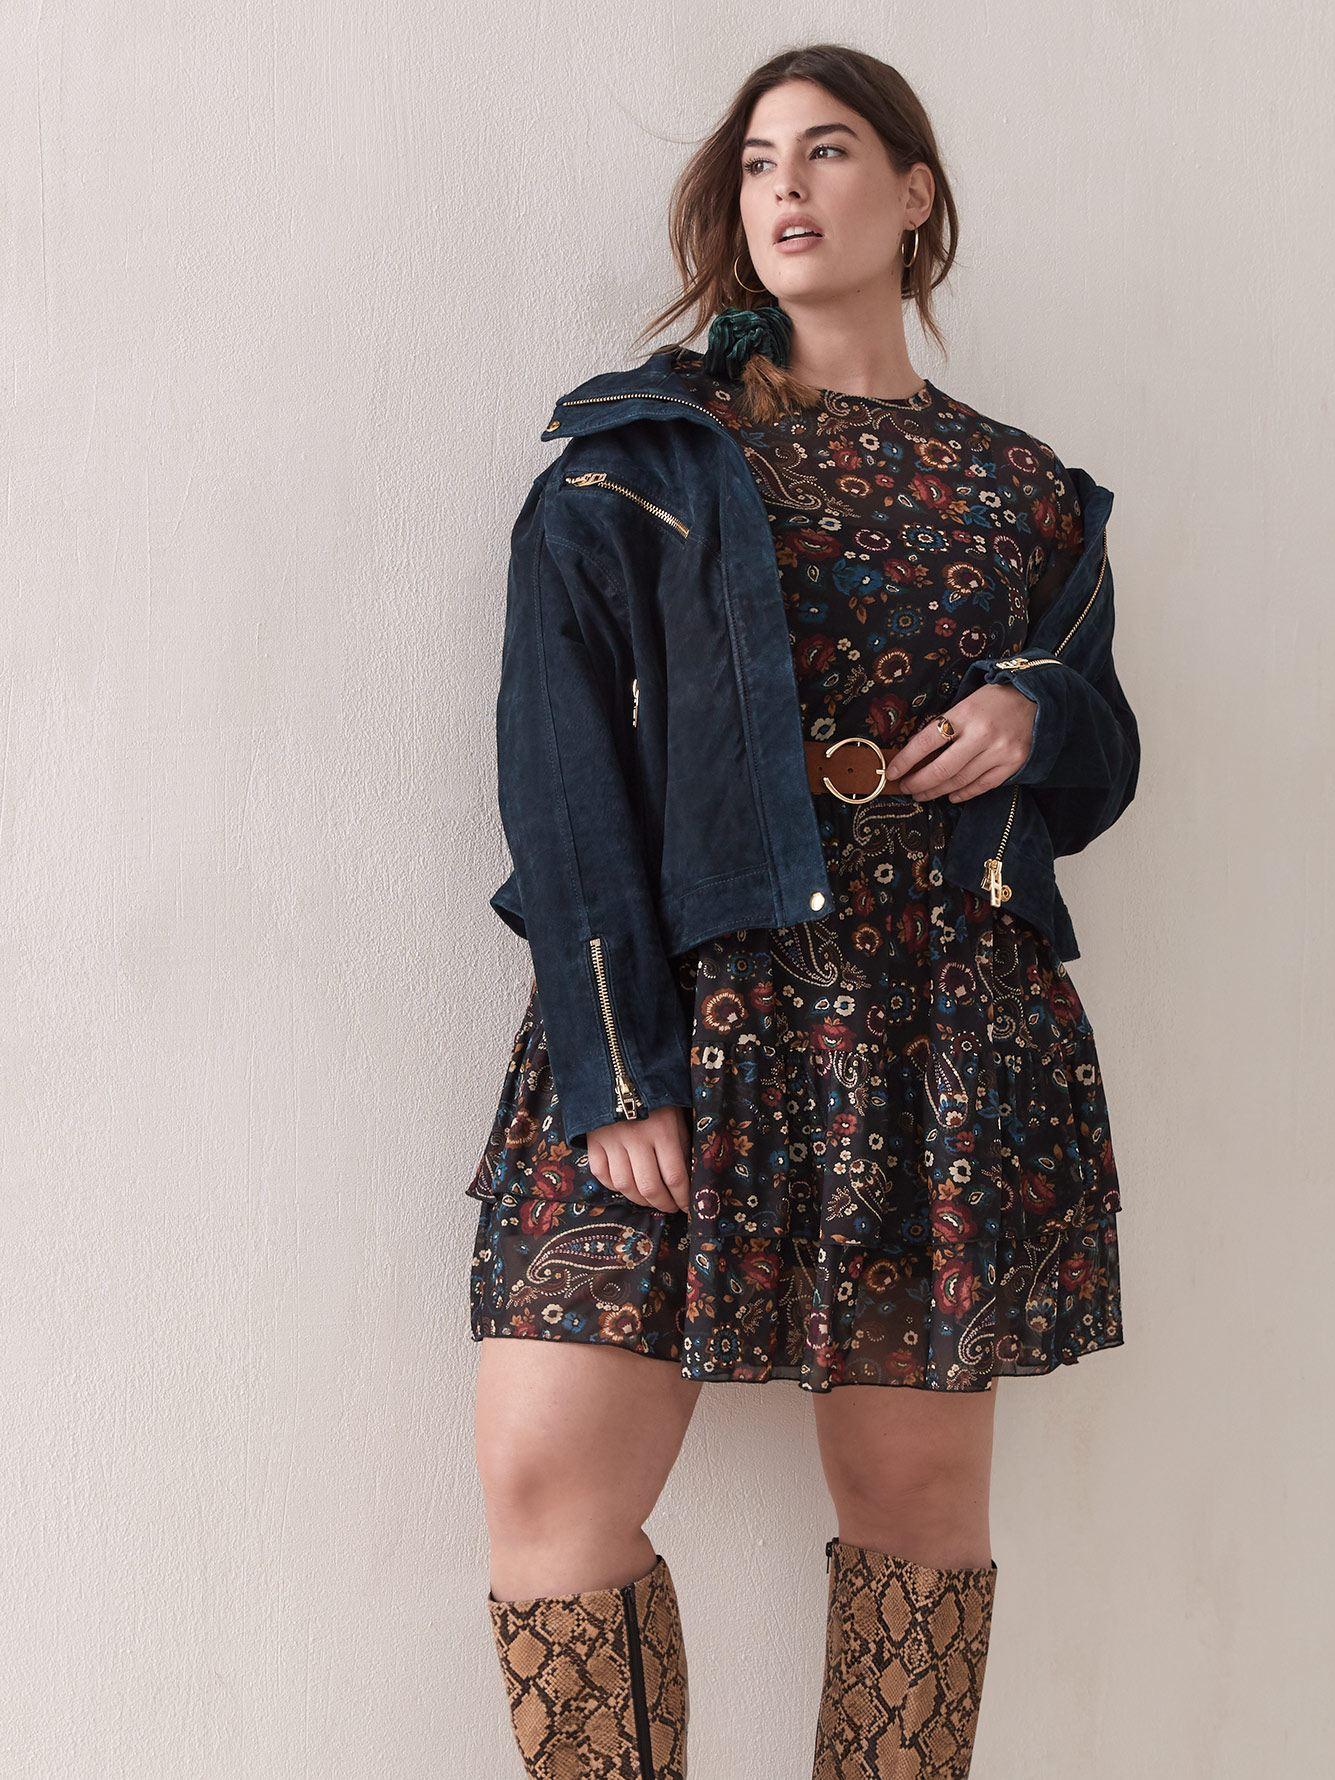 Paisley Ruffle Mesh Dress - Addition Elle